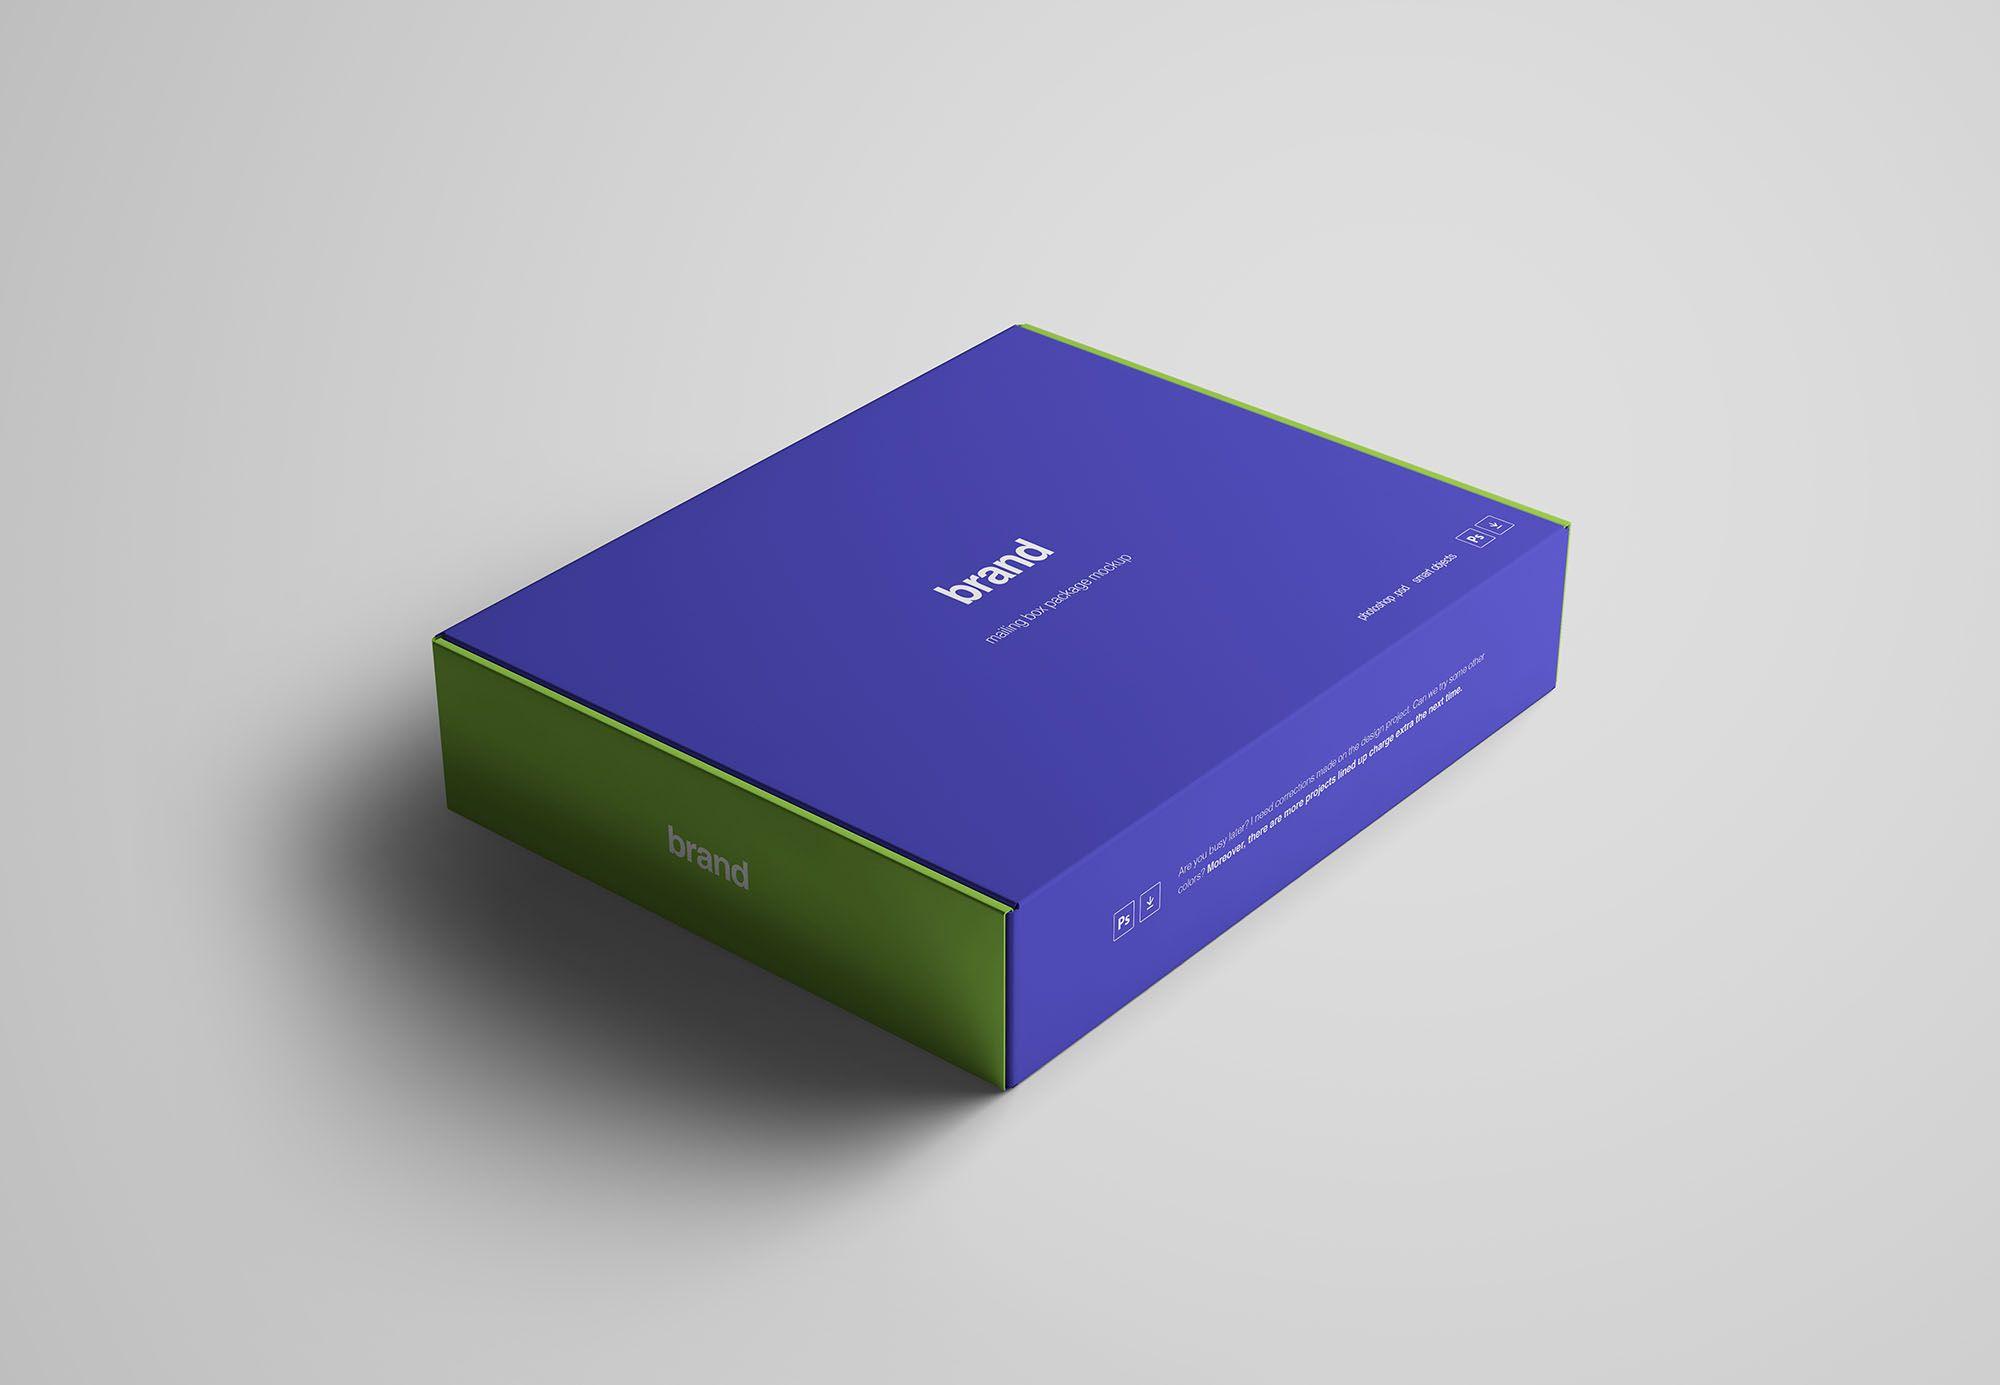 Download Advanced Package Box Mockup | Box mockup, Mockup, Box ...